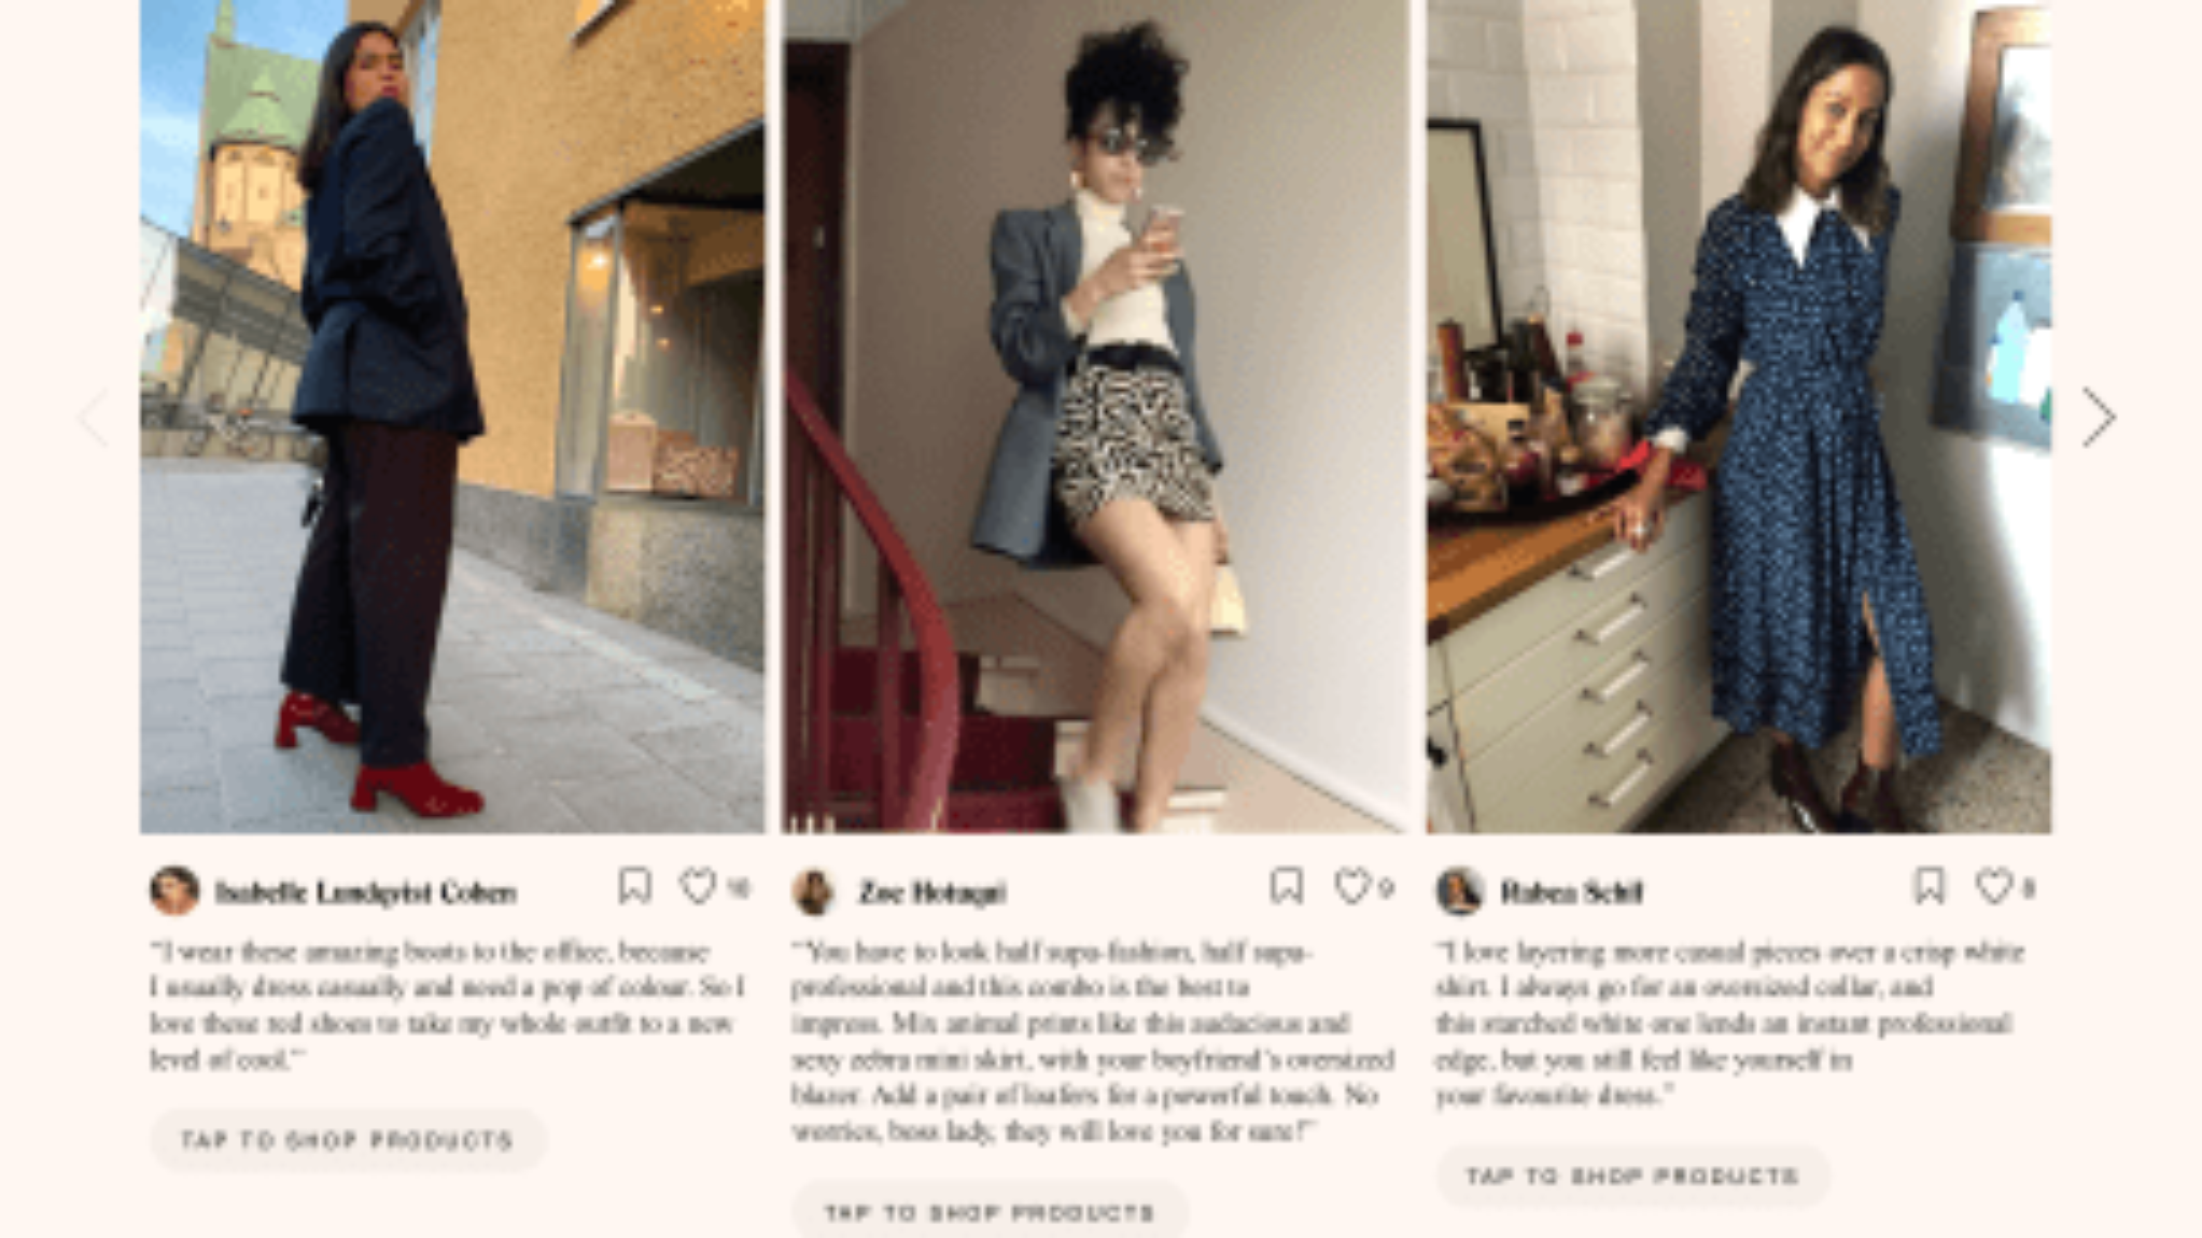 724672a8d4b4d H&M launches Itsapark, an Instagram-influencer-style shopping ...